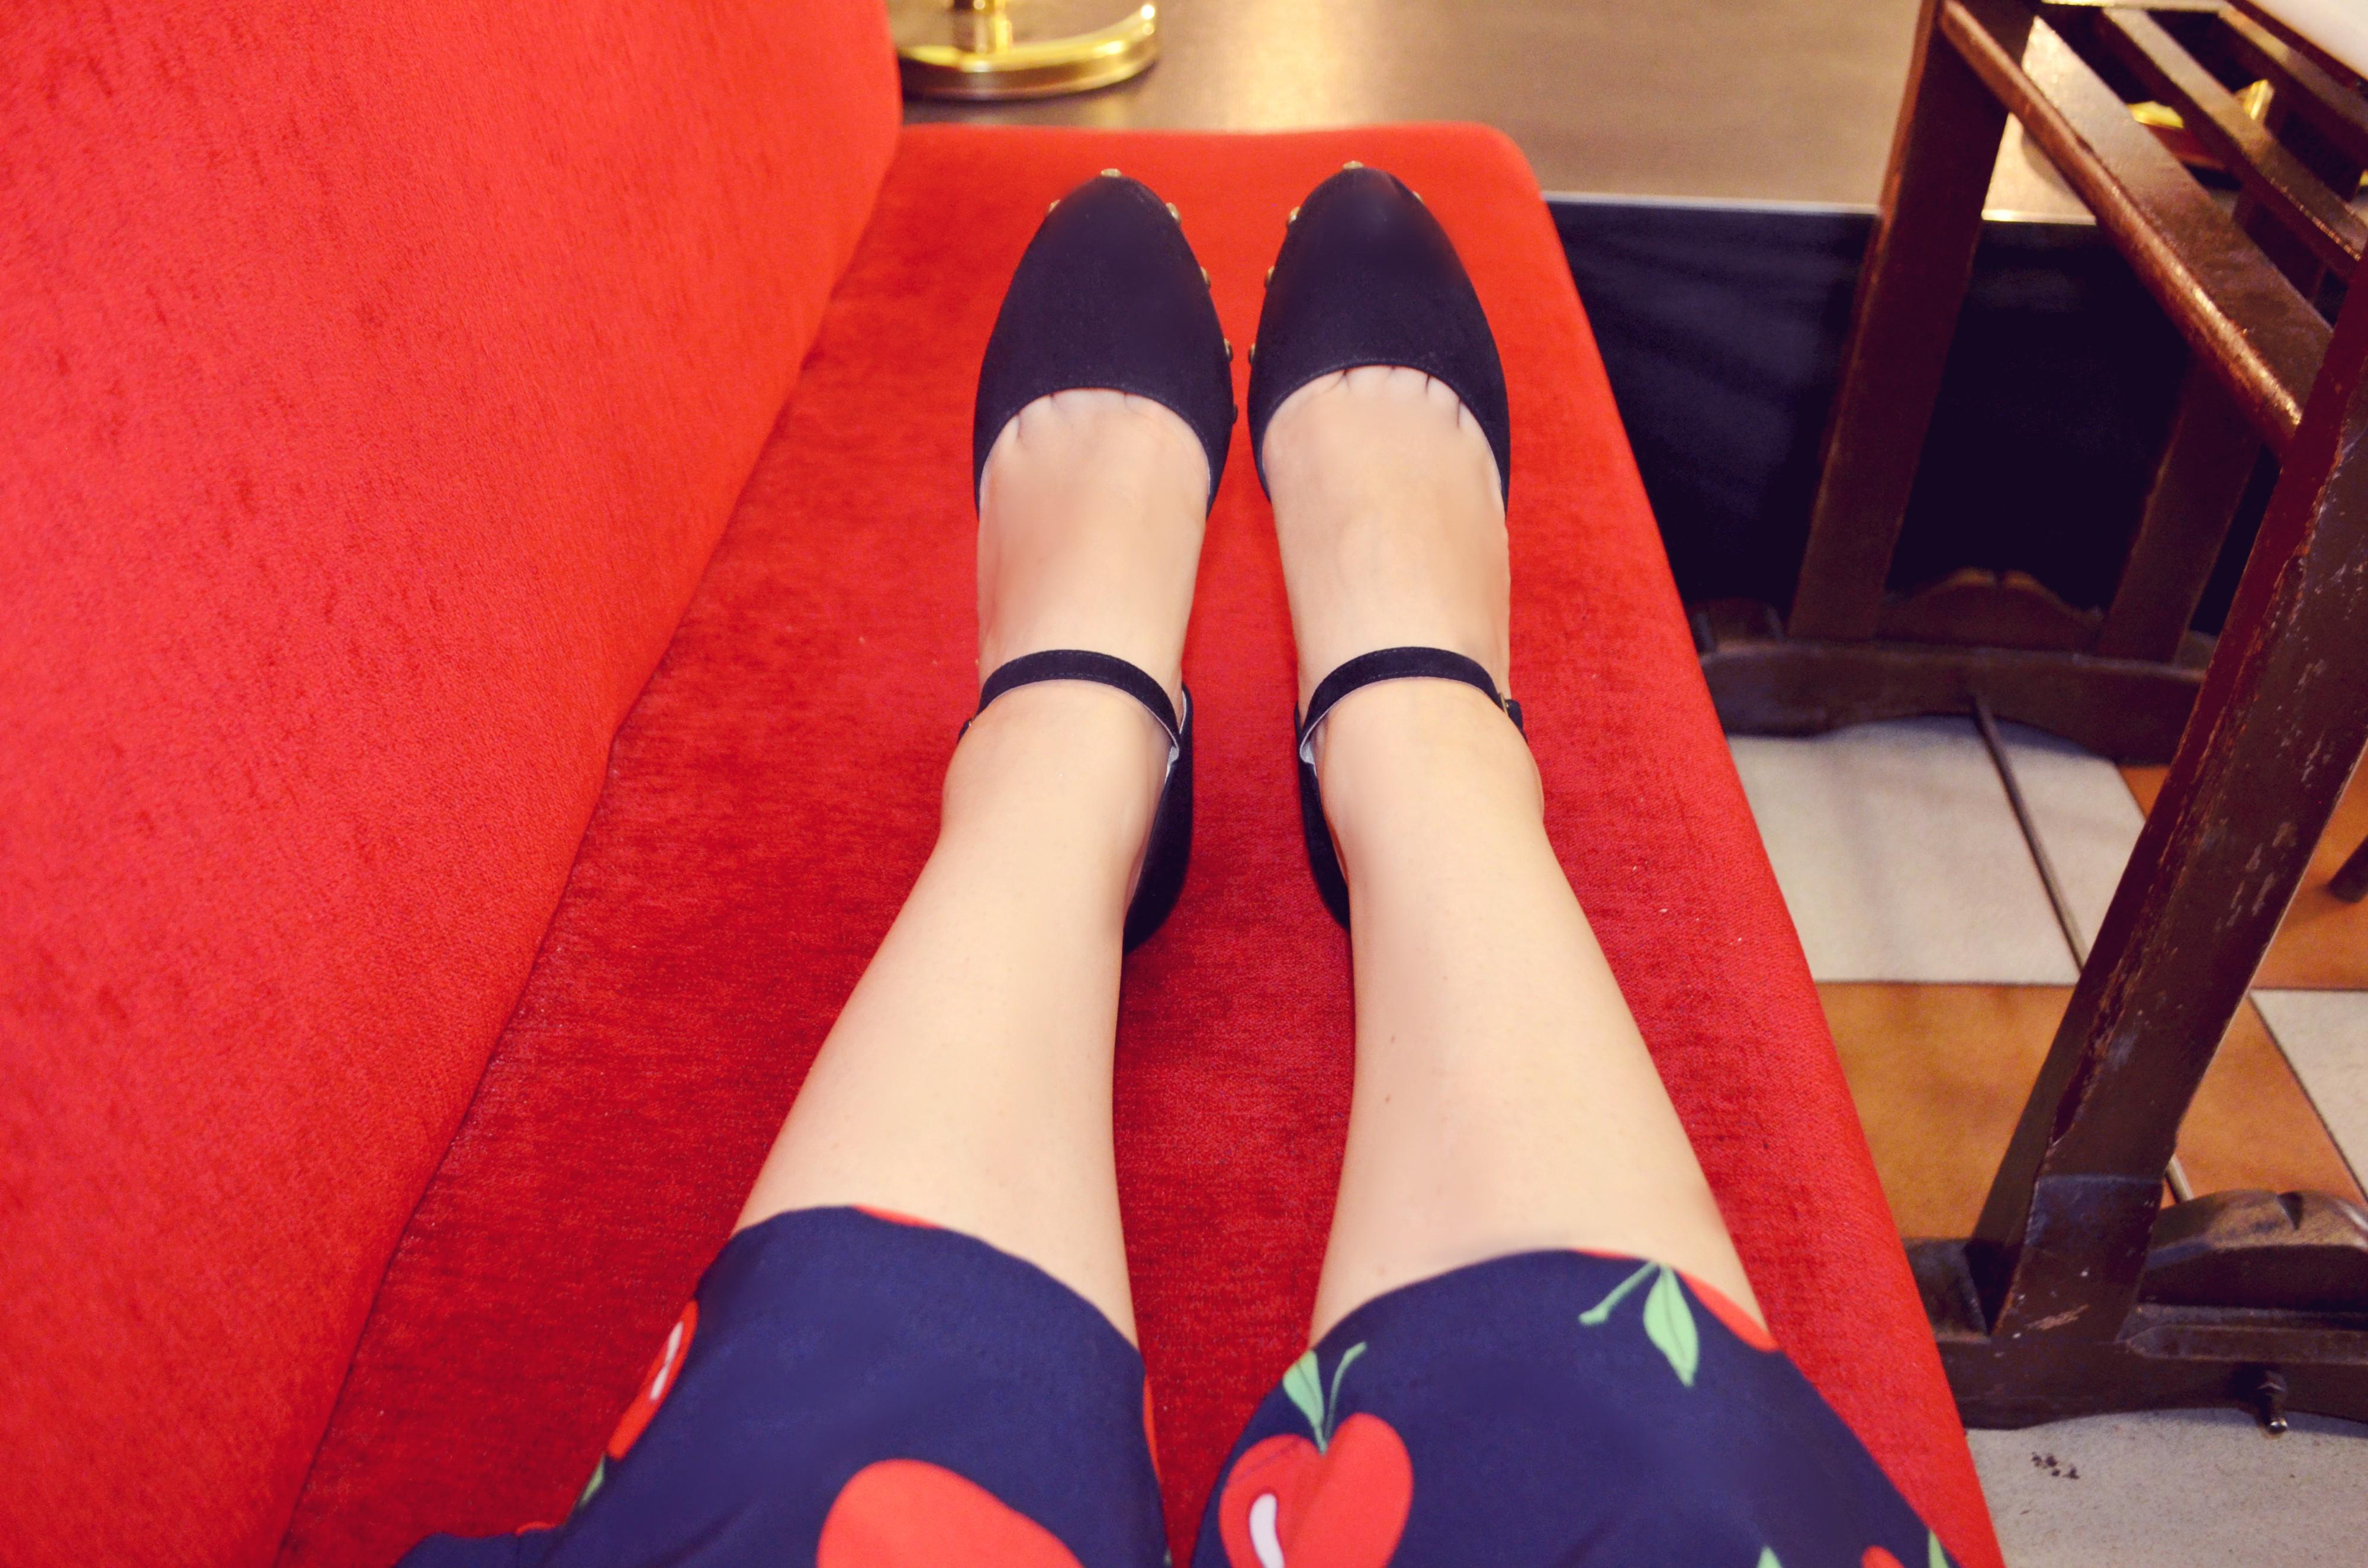 Zapatos-justfab-fashionista-blog-de-moda-ChicAdicta-influencer-Madrid-Chic-Adicta-retro-shoes-PiensaenChic-Piensa-en-Chic